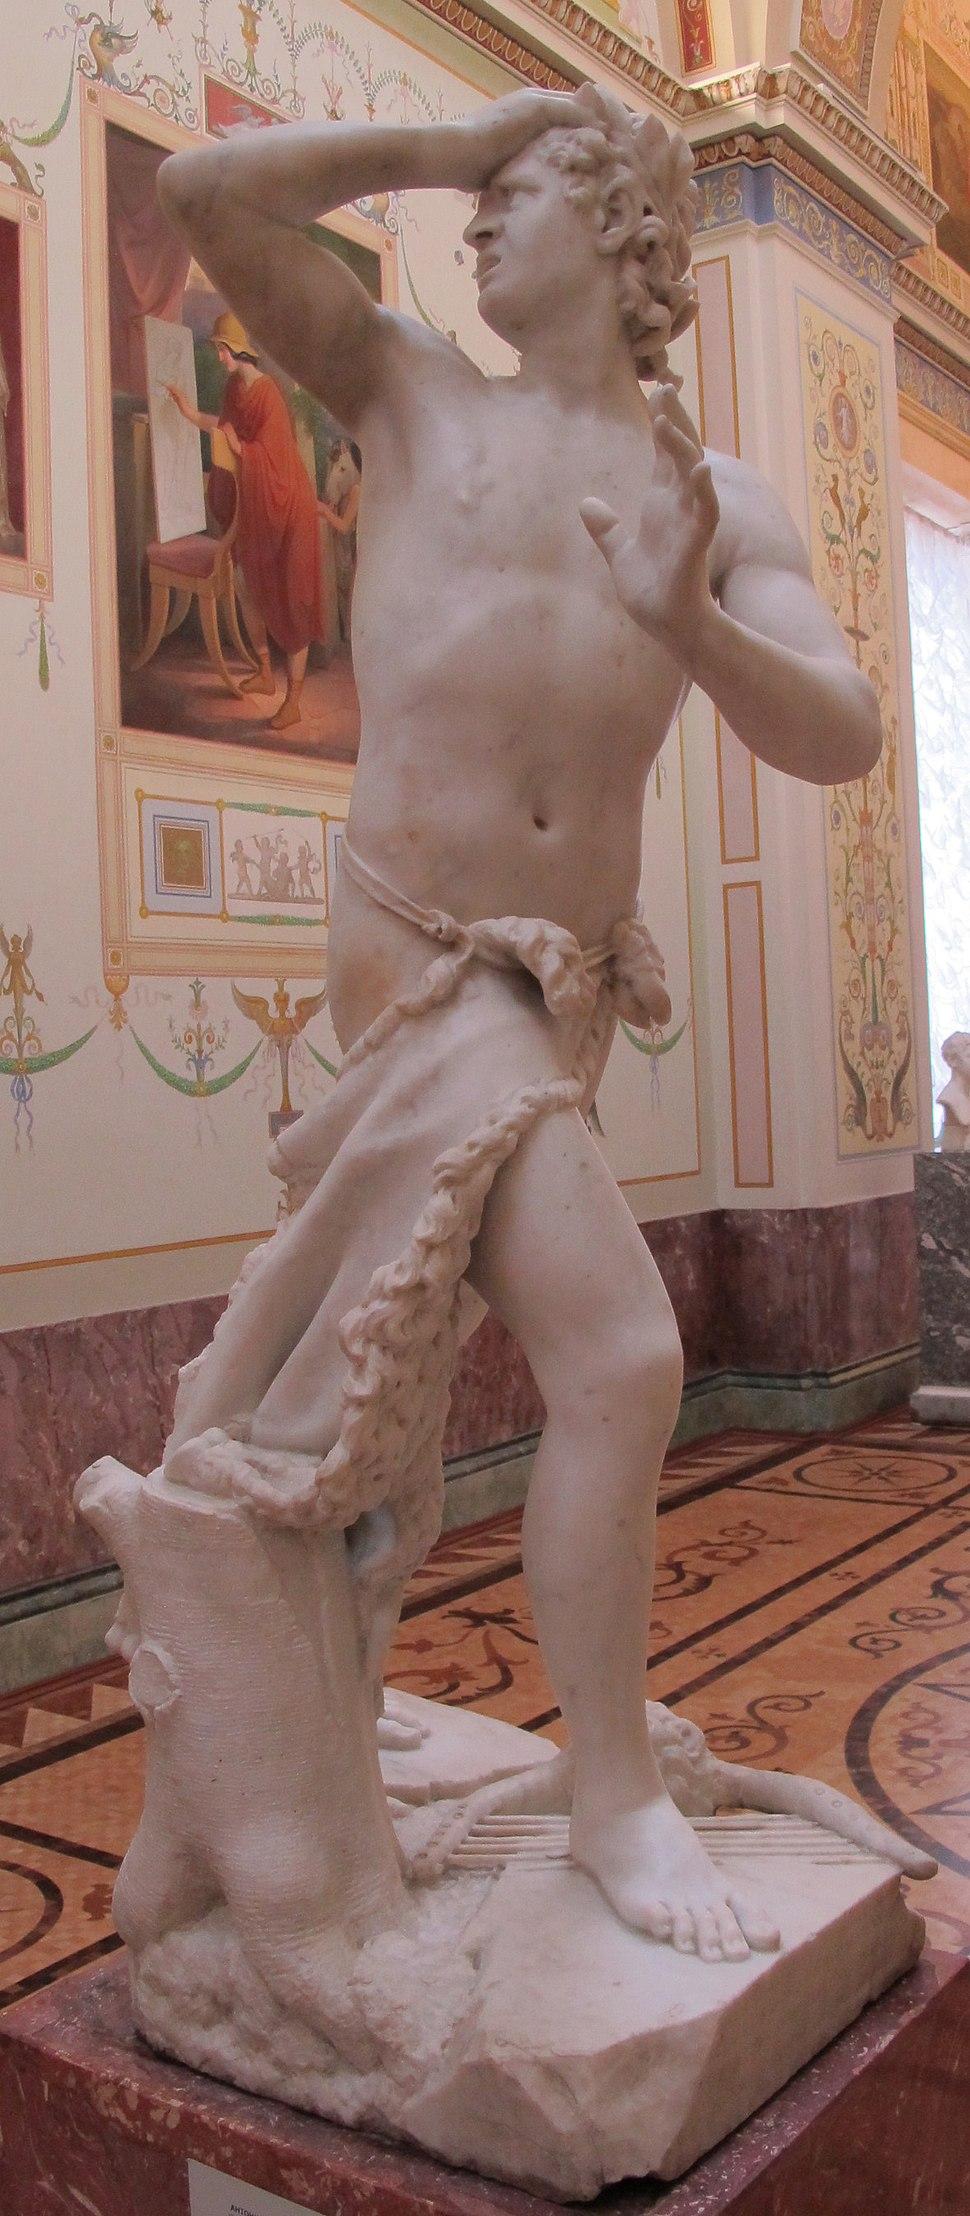 Antonio canova, orfeo, 1777, 01